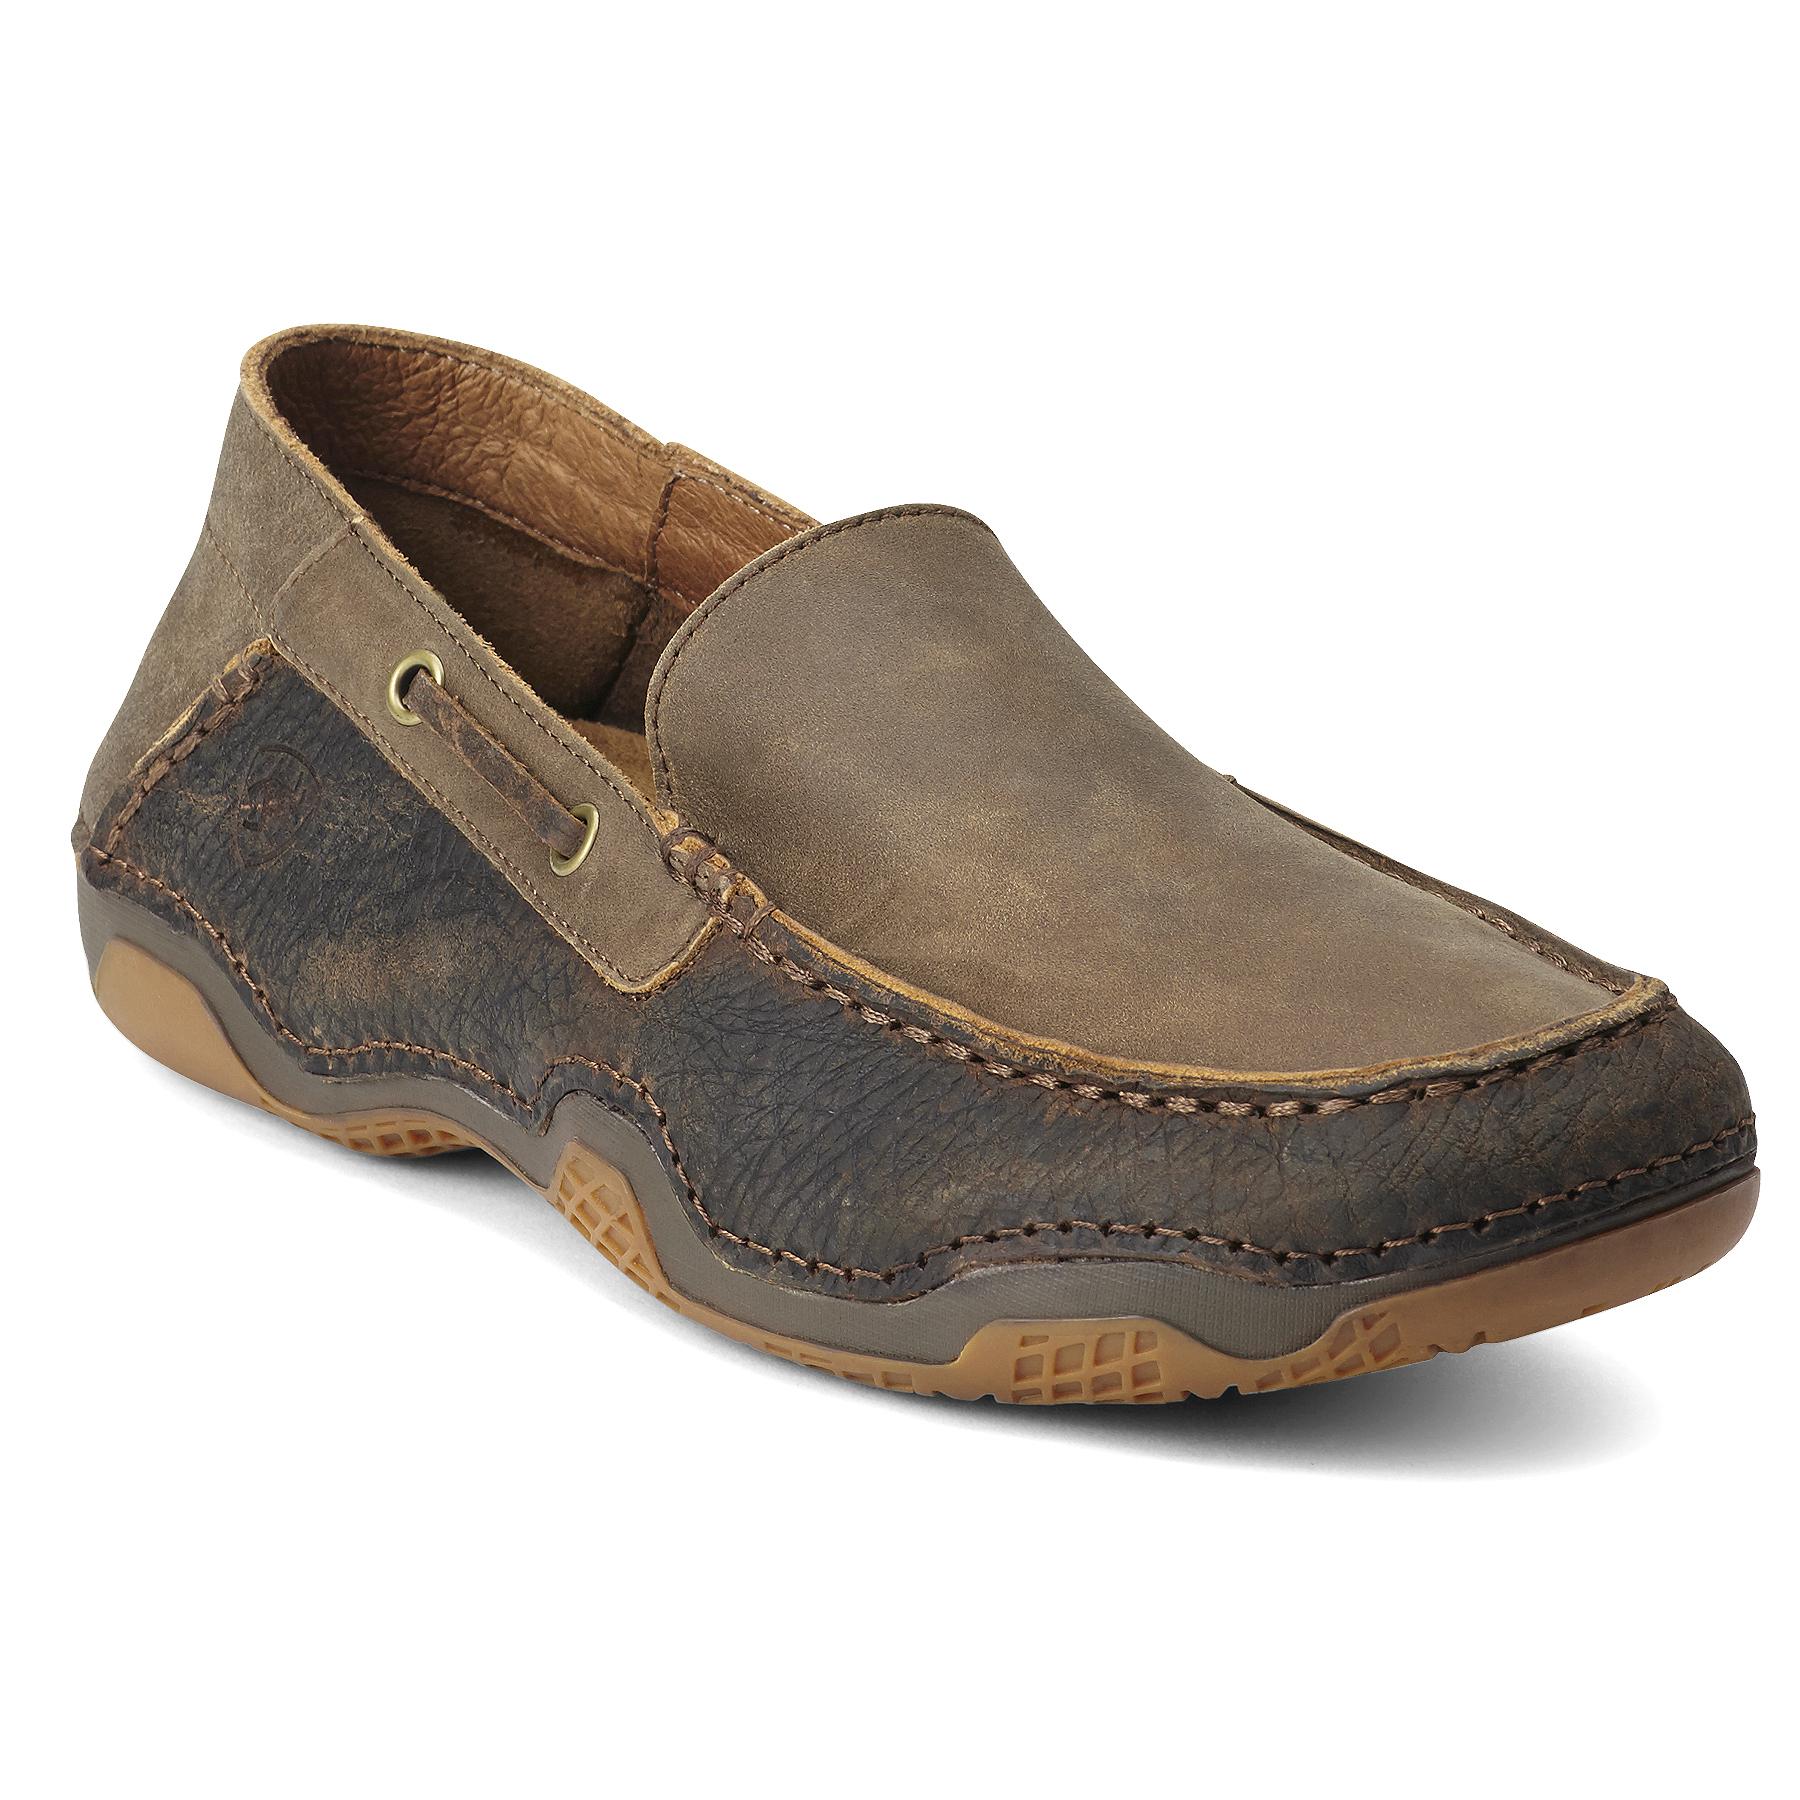 Ariat Gleeson Slipon Shoe